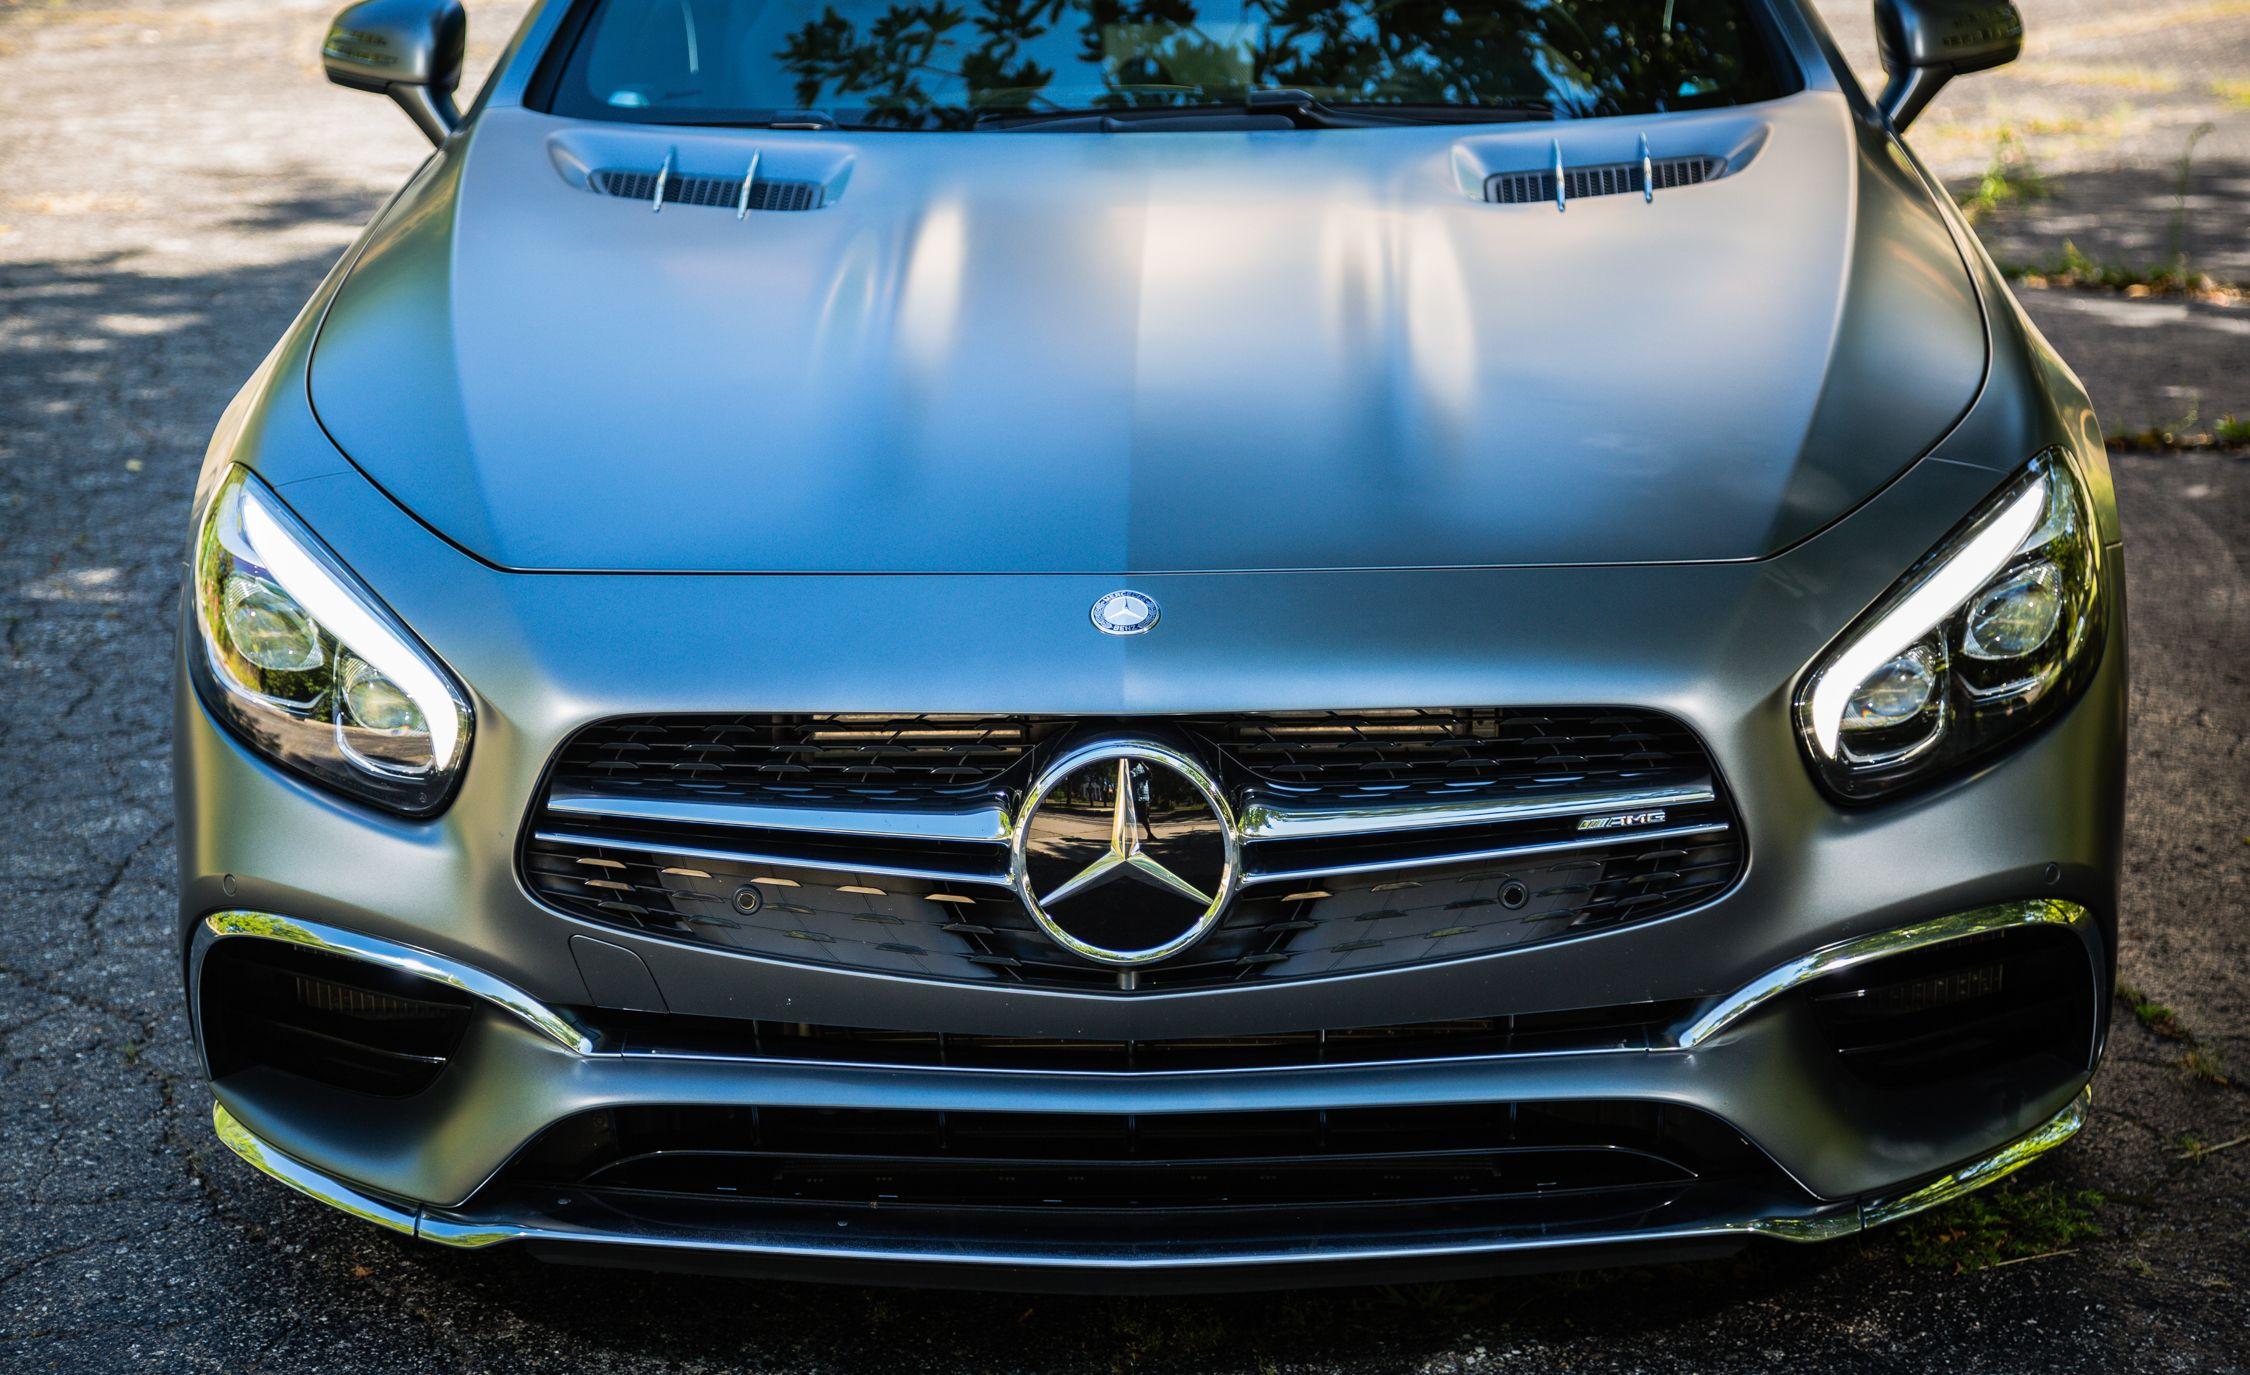 https://hips.hearstapps.com/amv-prod-cad-assets.s3.amazonaws.com/wp-content/uploads/2016/08/2017-Mercedes-AMG-SL65-124.jpg